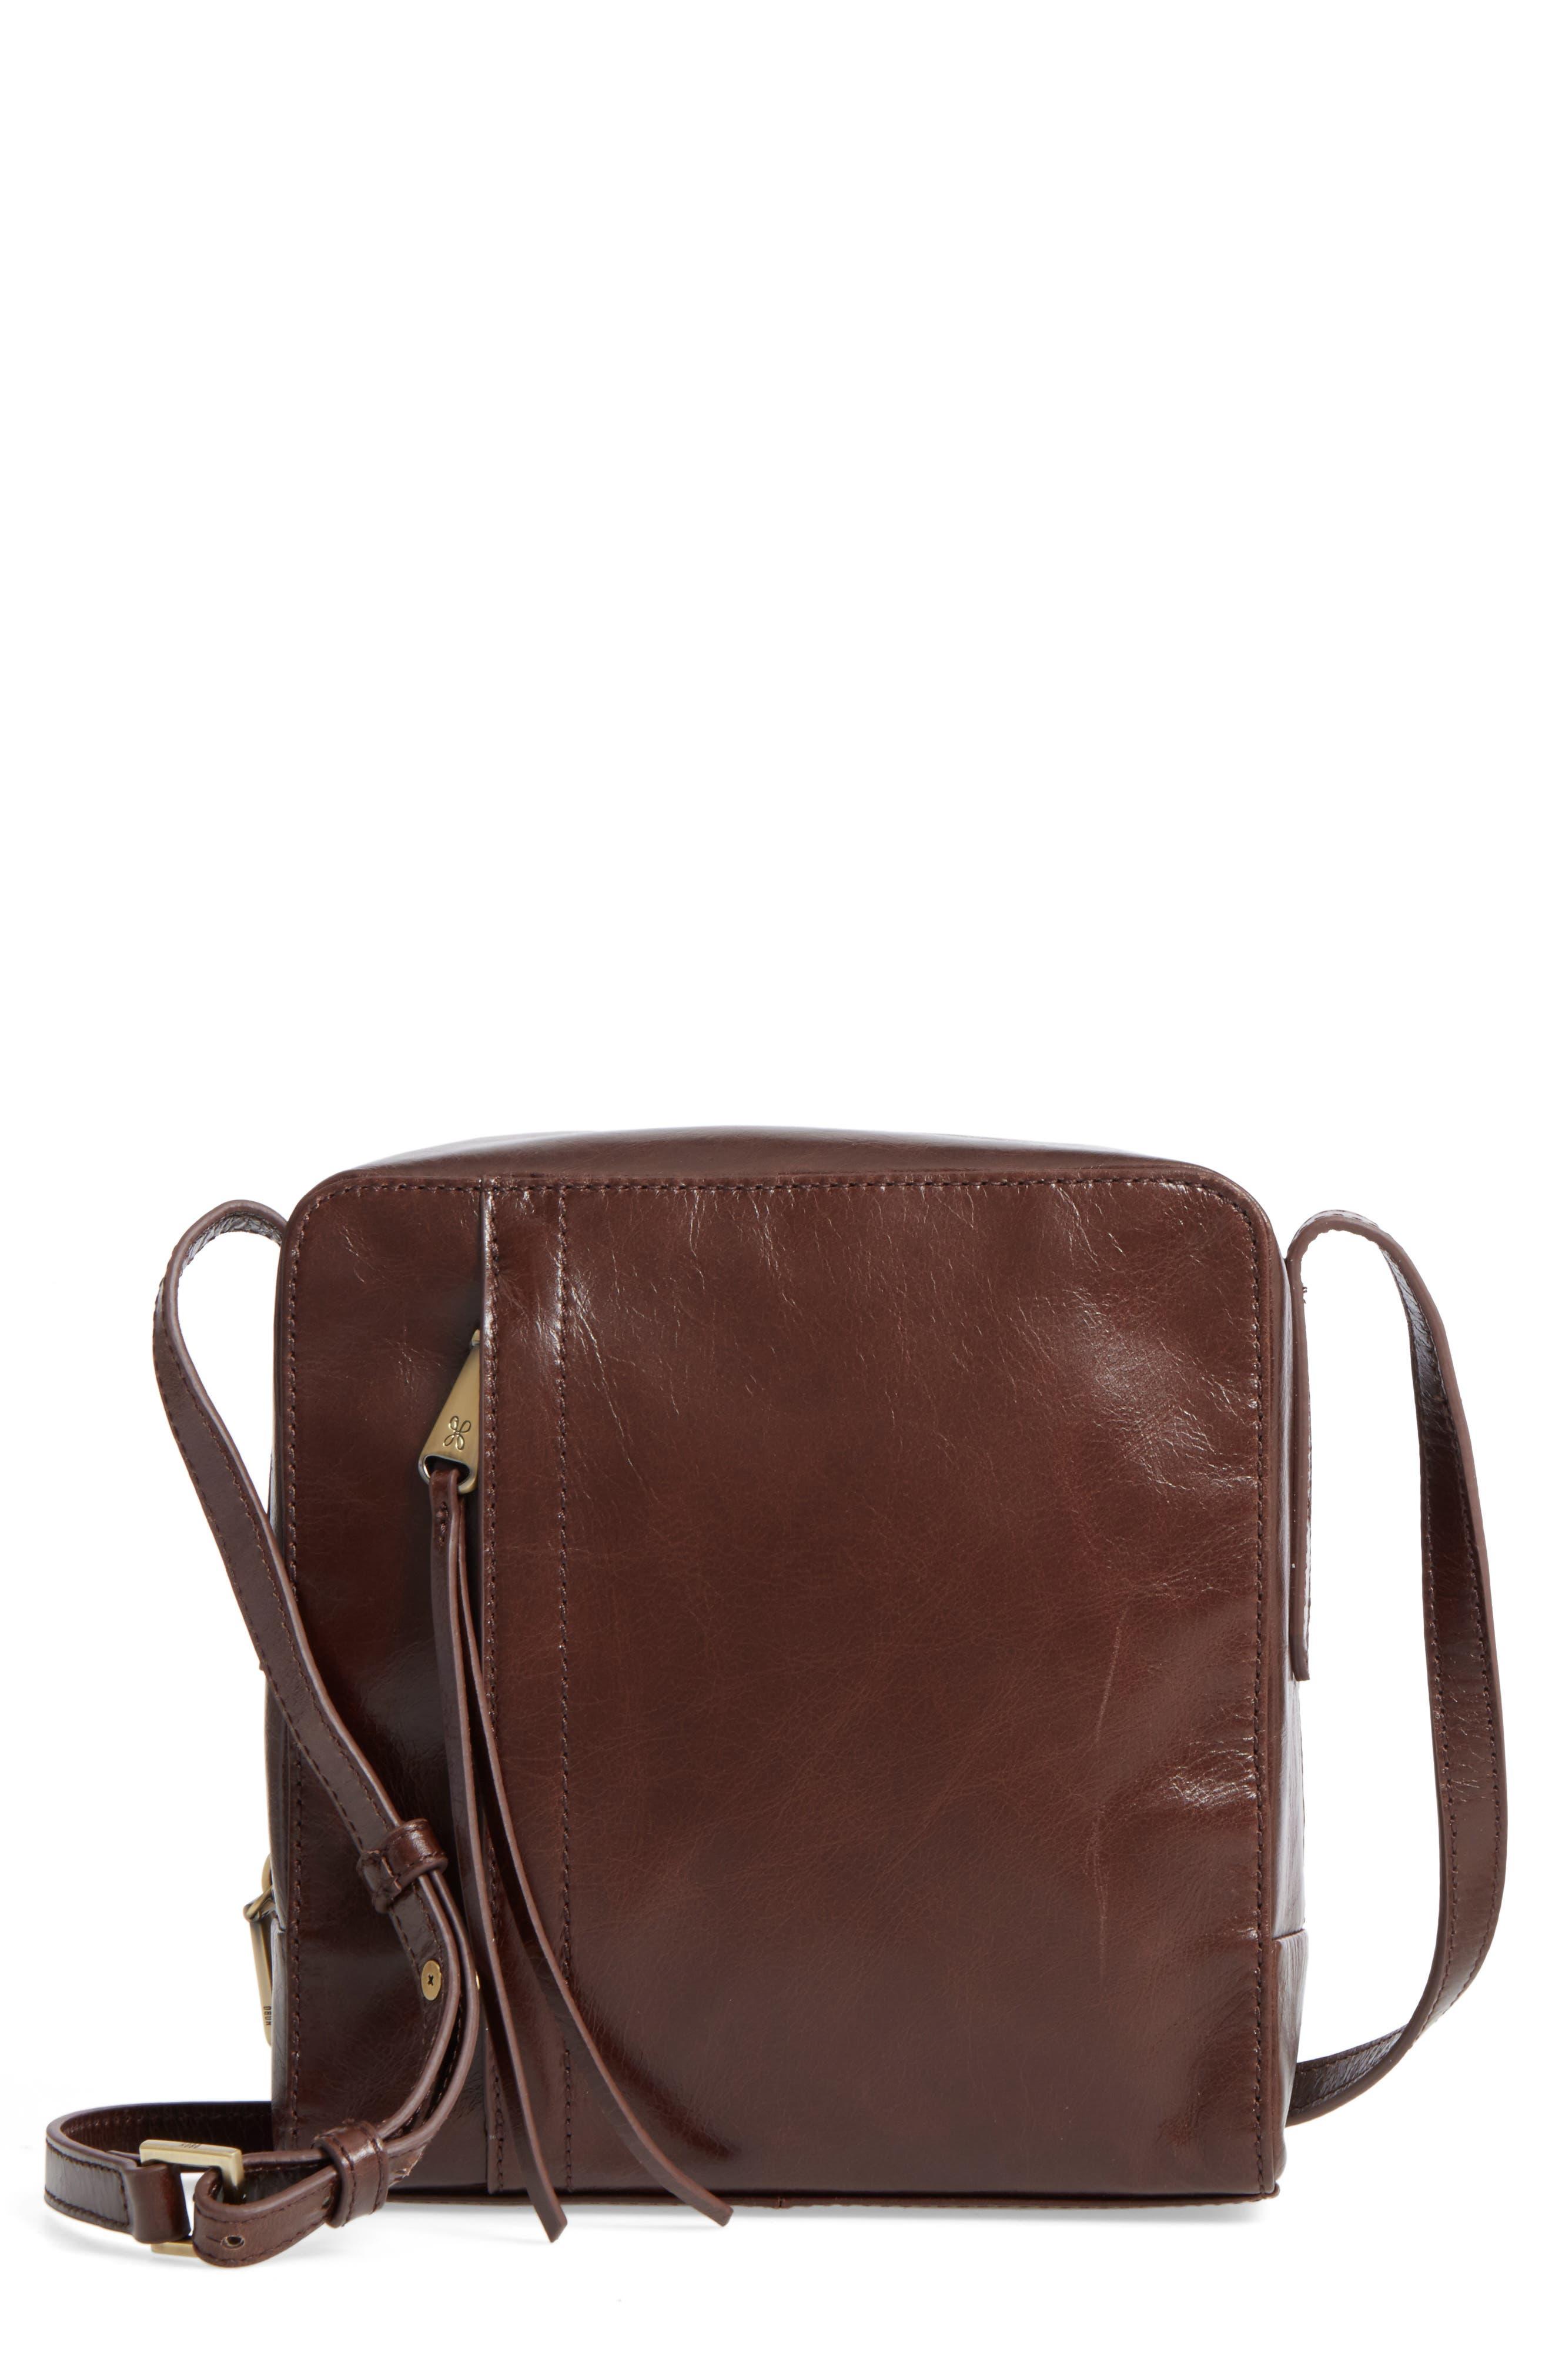 Lyric Leather Crossbody Bag,                         Main,                         color, Espresso